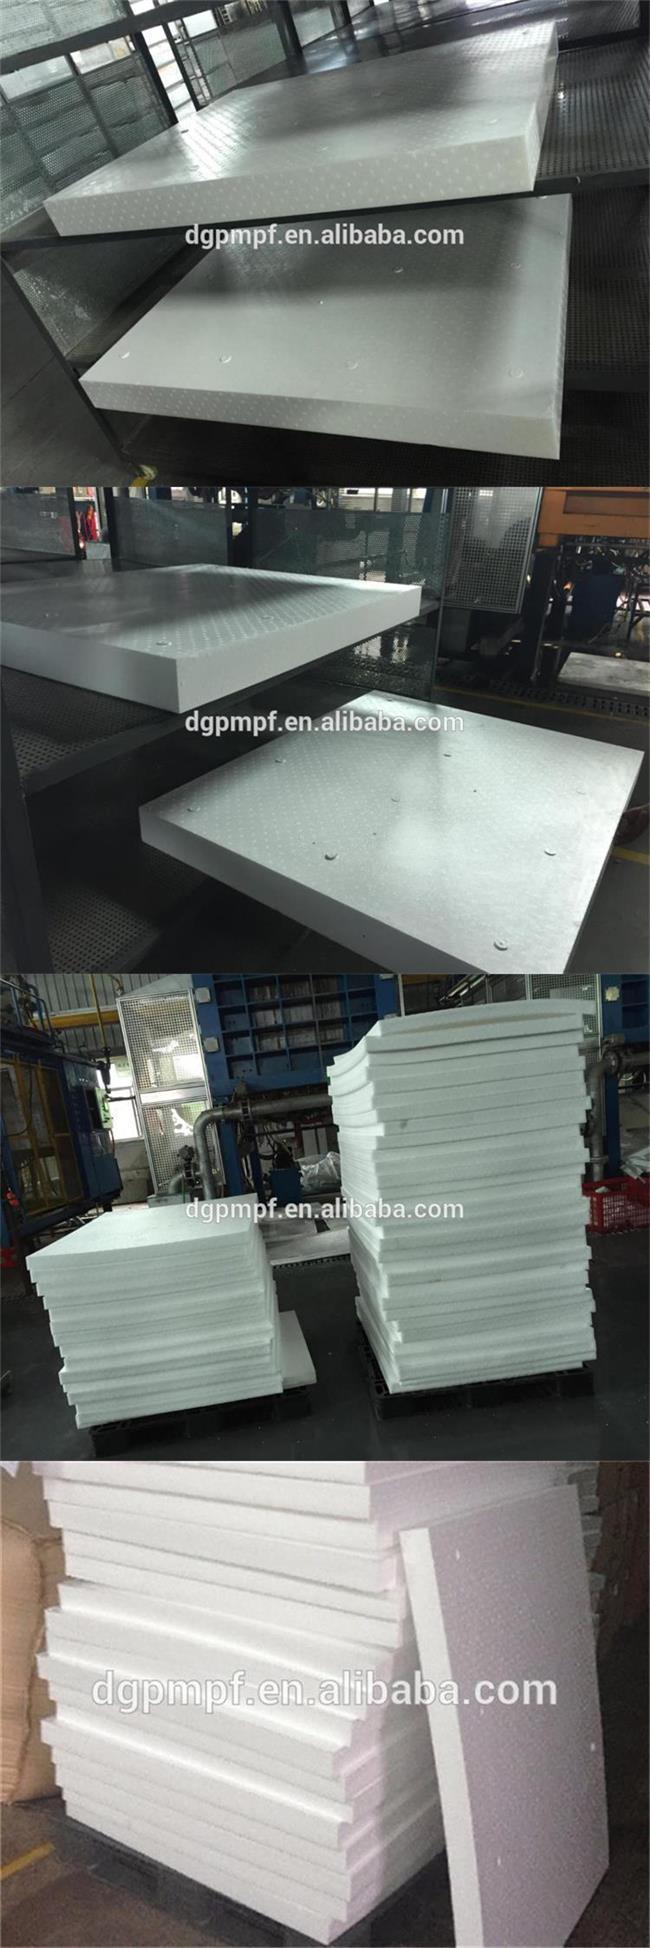 Custom Hot Sale Lightweight Anti-Impact Insulating Epo Foam Sheets